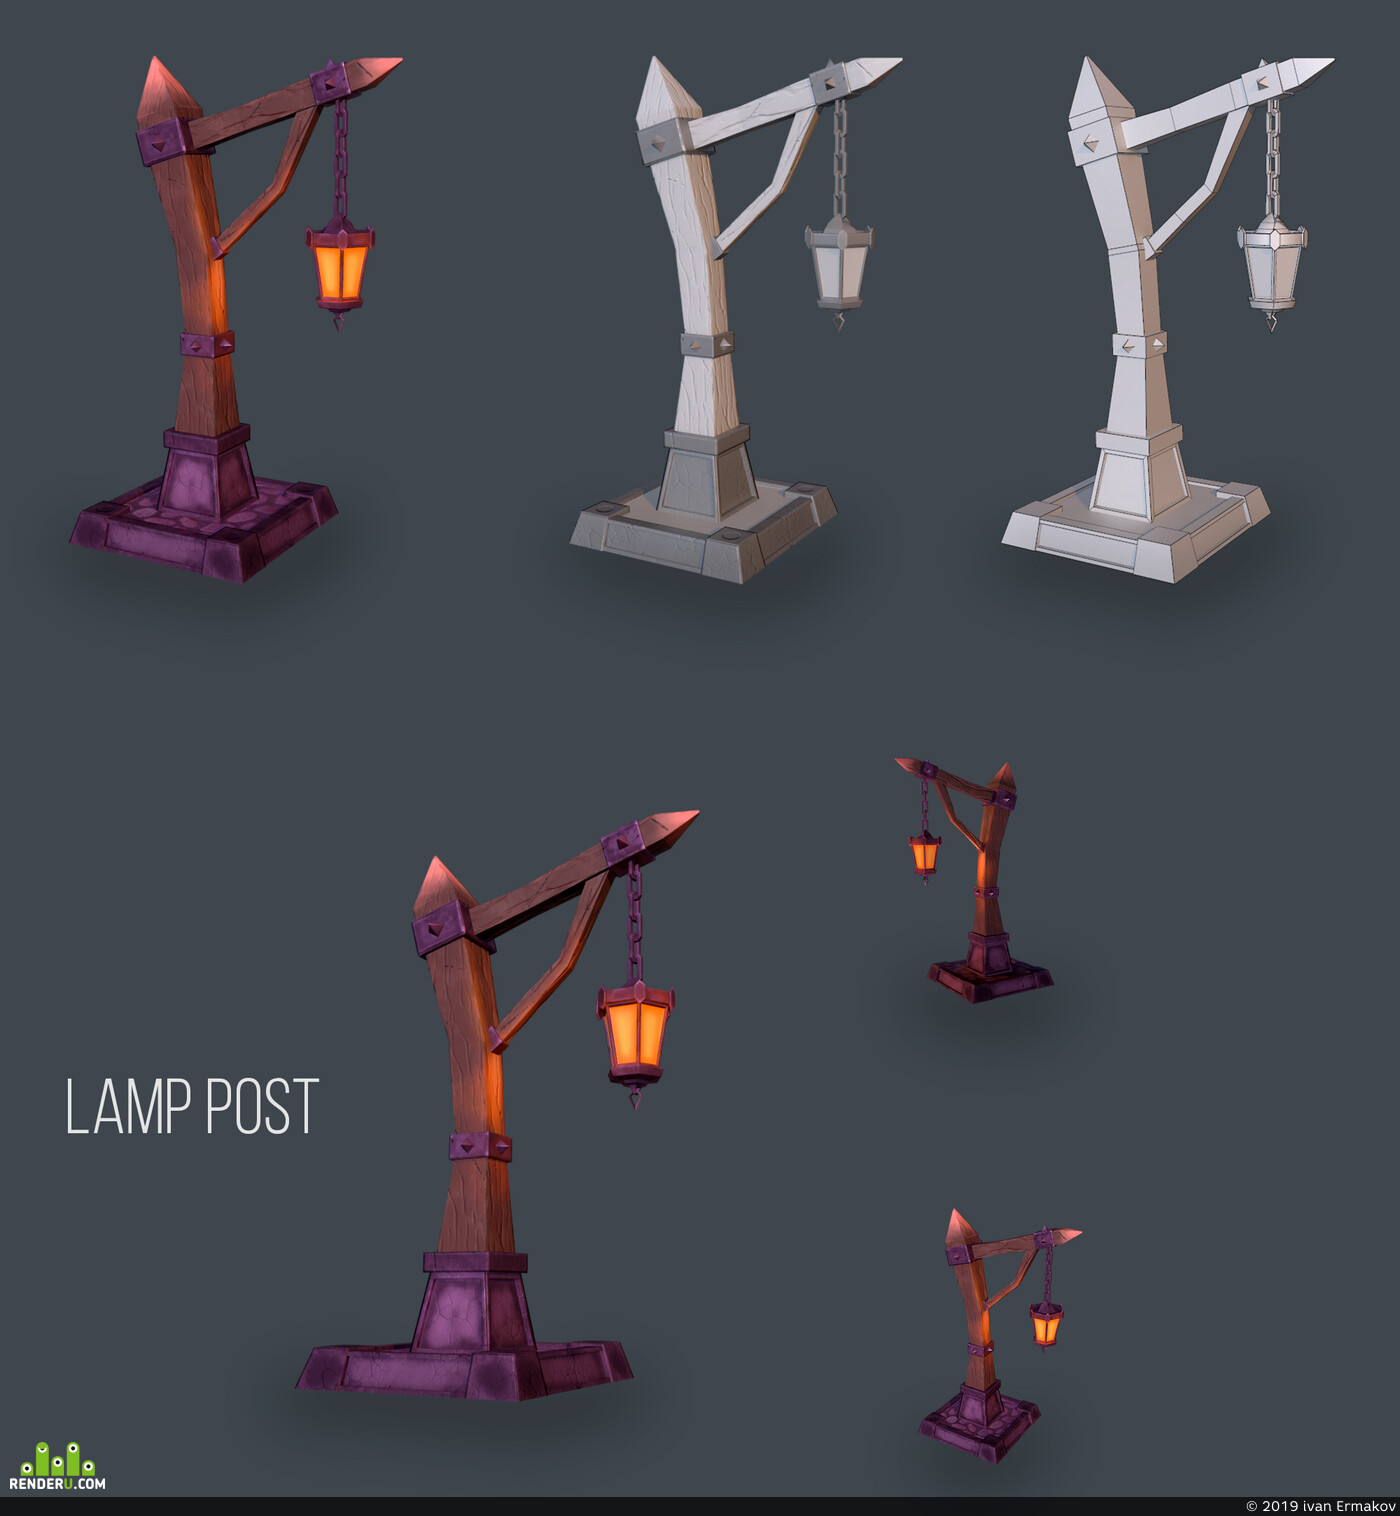 lAMP POST, 3D Studio Max, substance painter, gamedevelopment